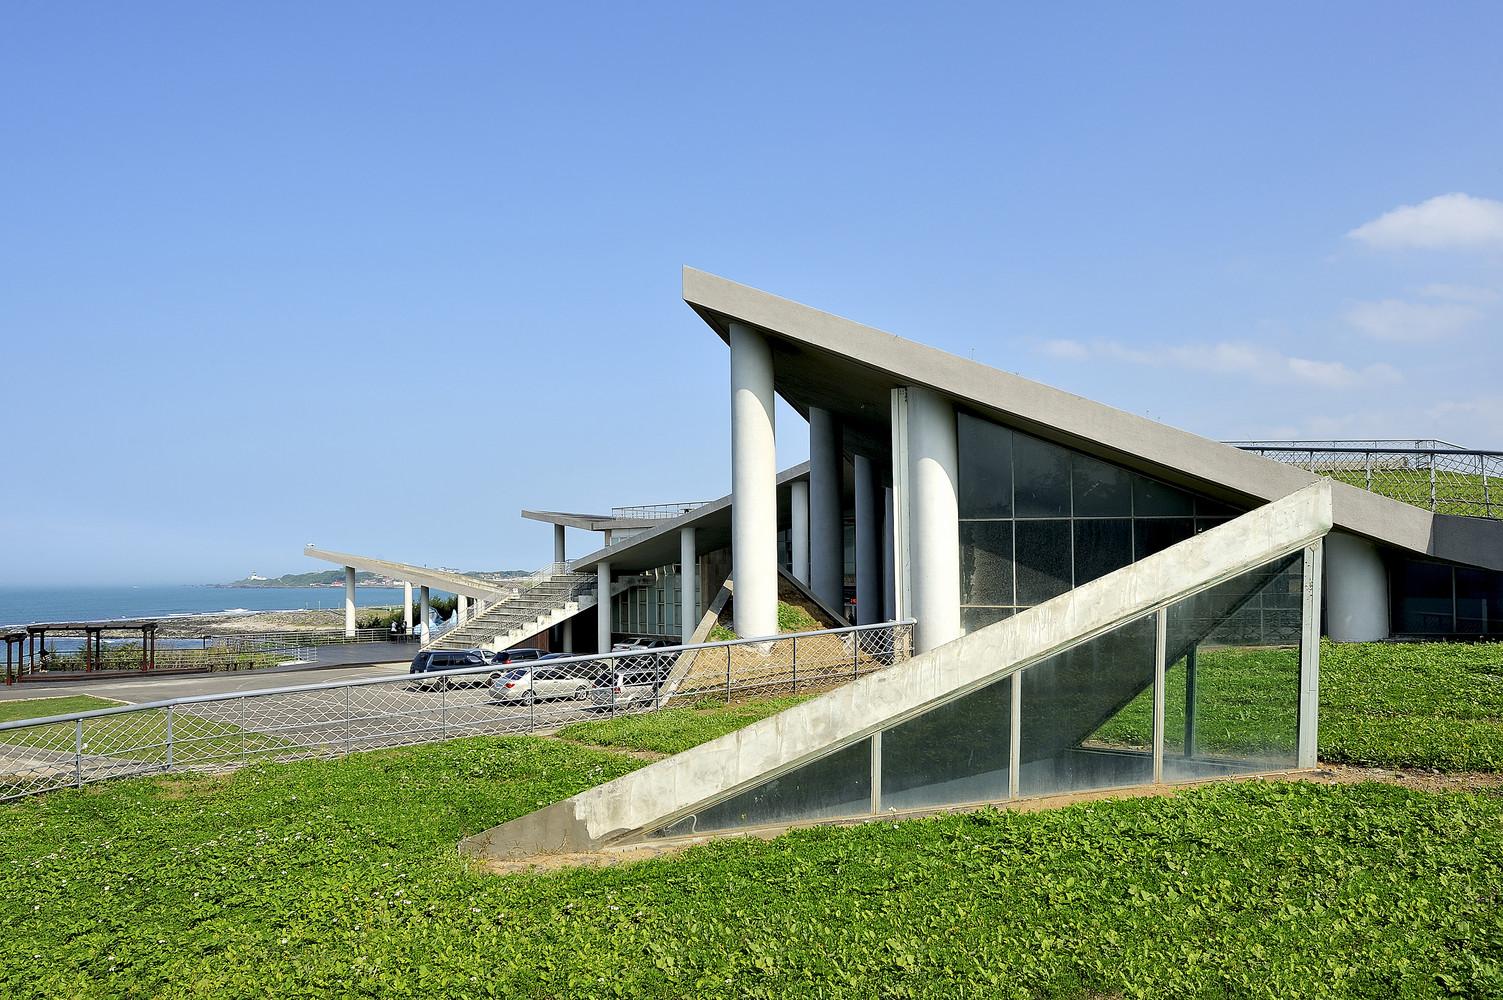 Baisha Wan Beach and Visitor Centre / Wang Weijen Architecture